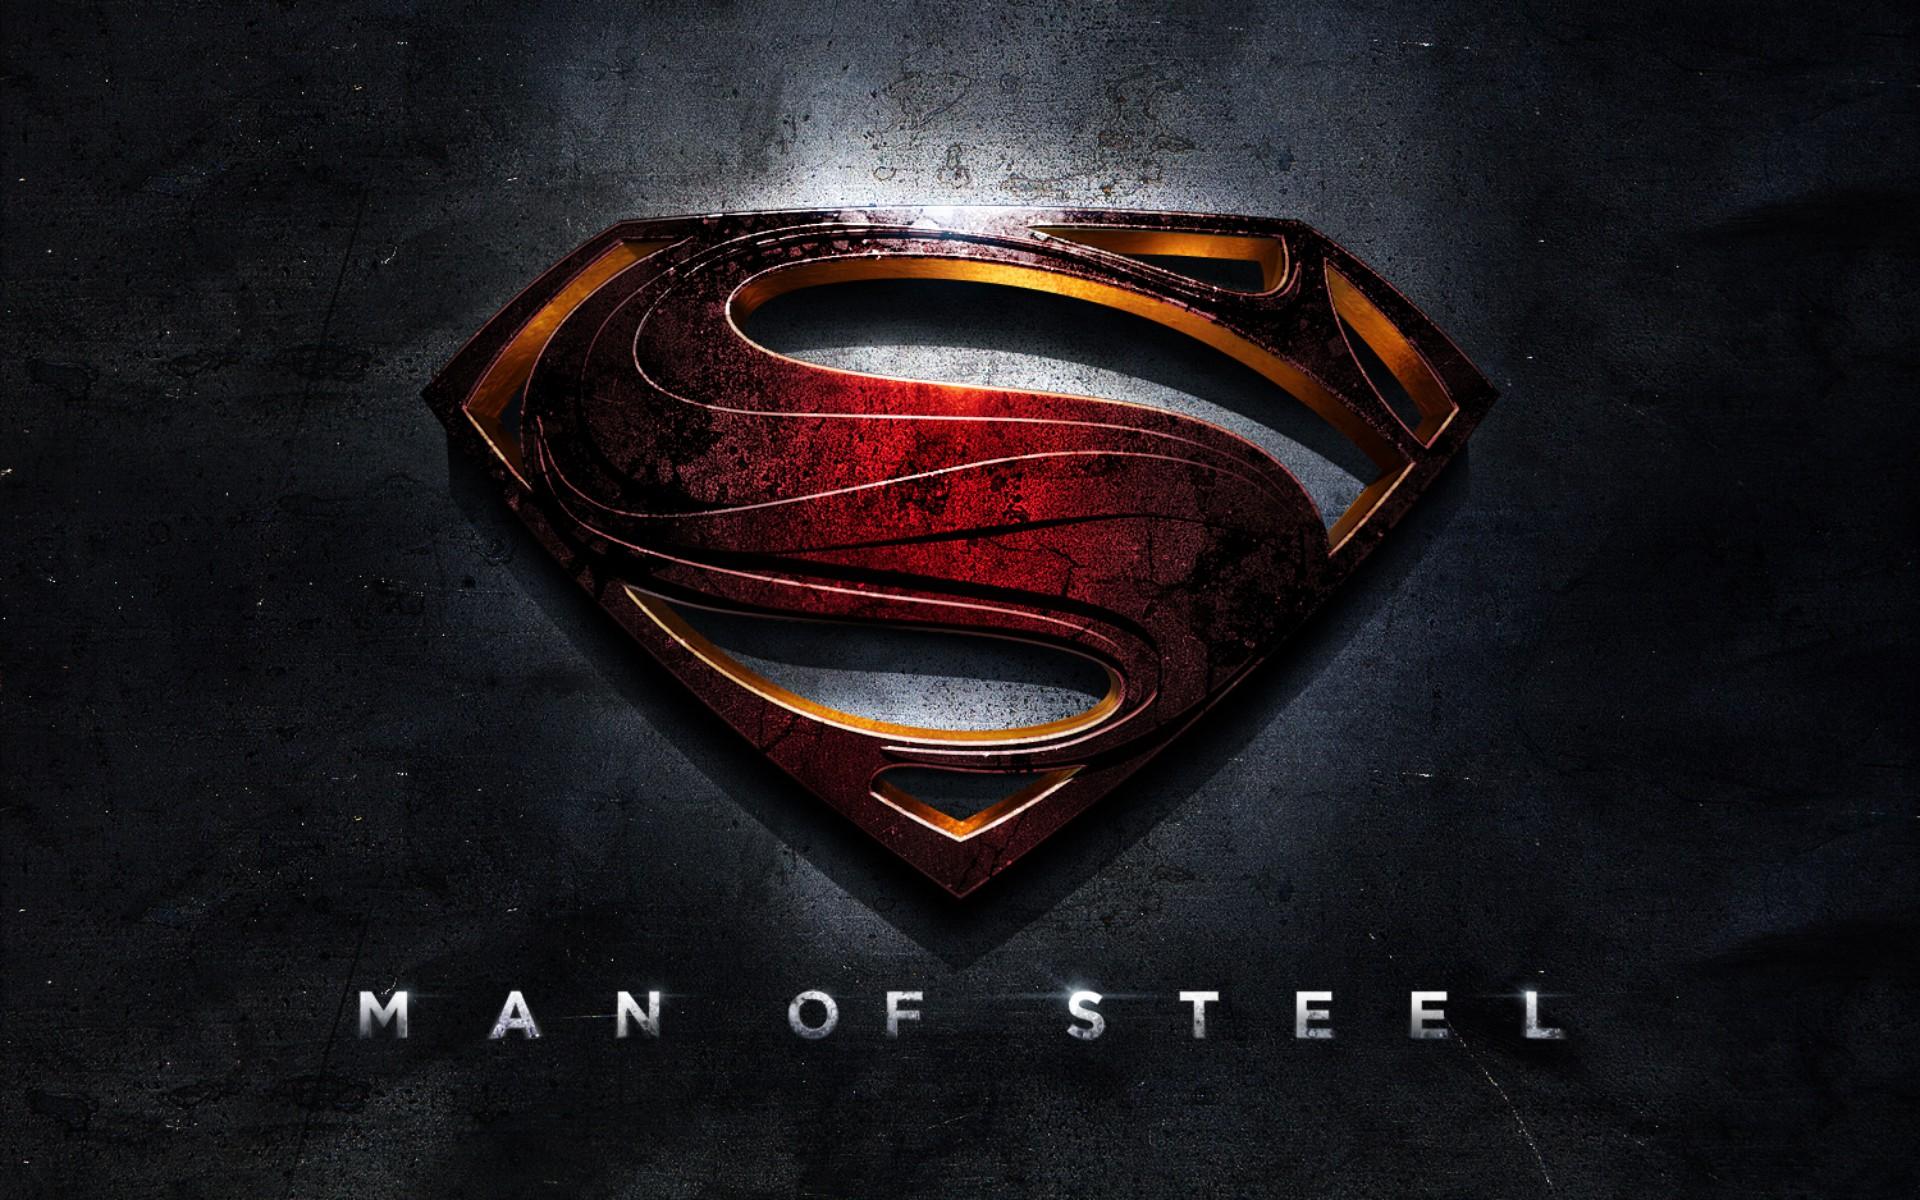 Man of Steel